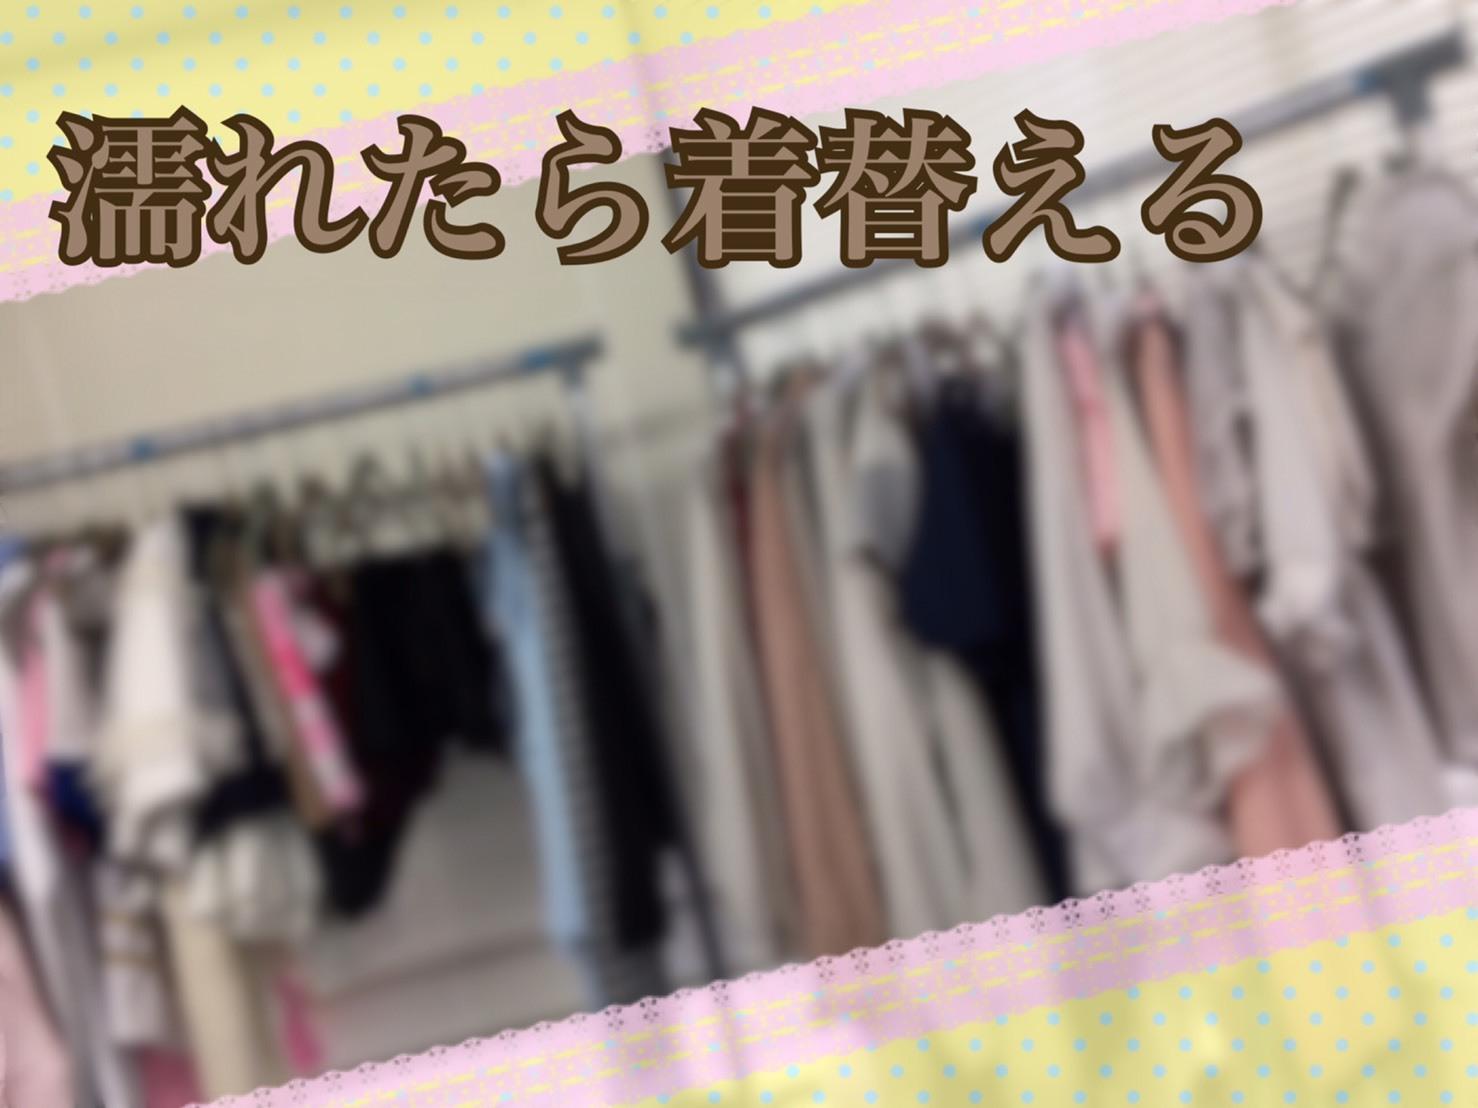 S__30269458.jpg